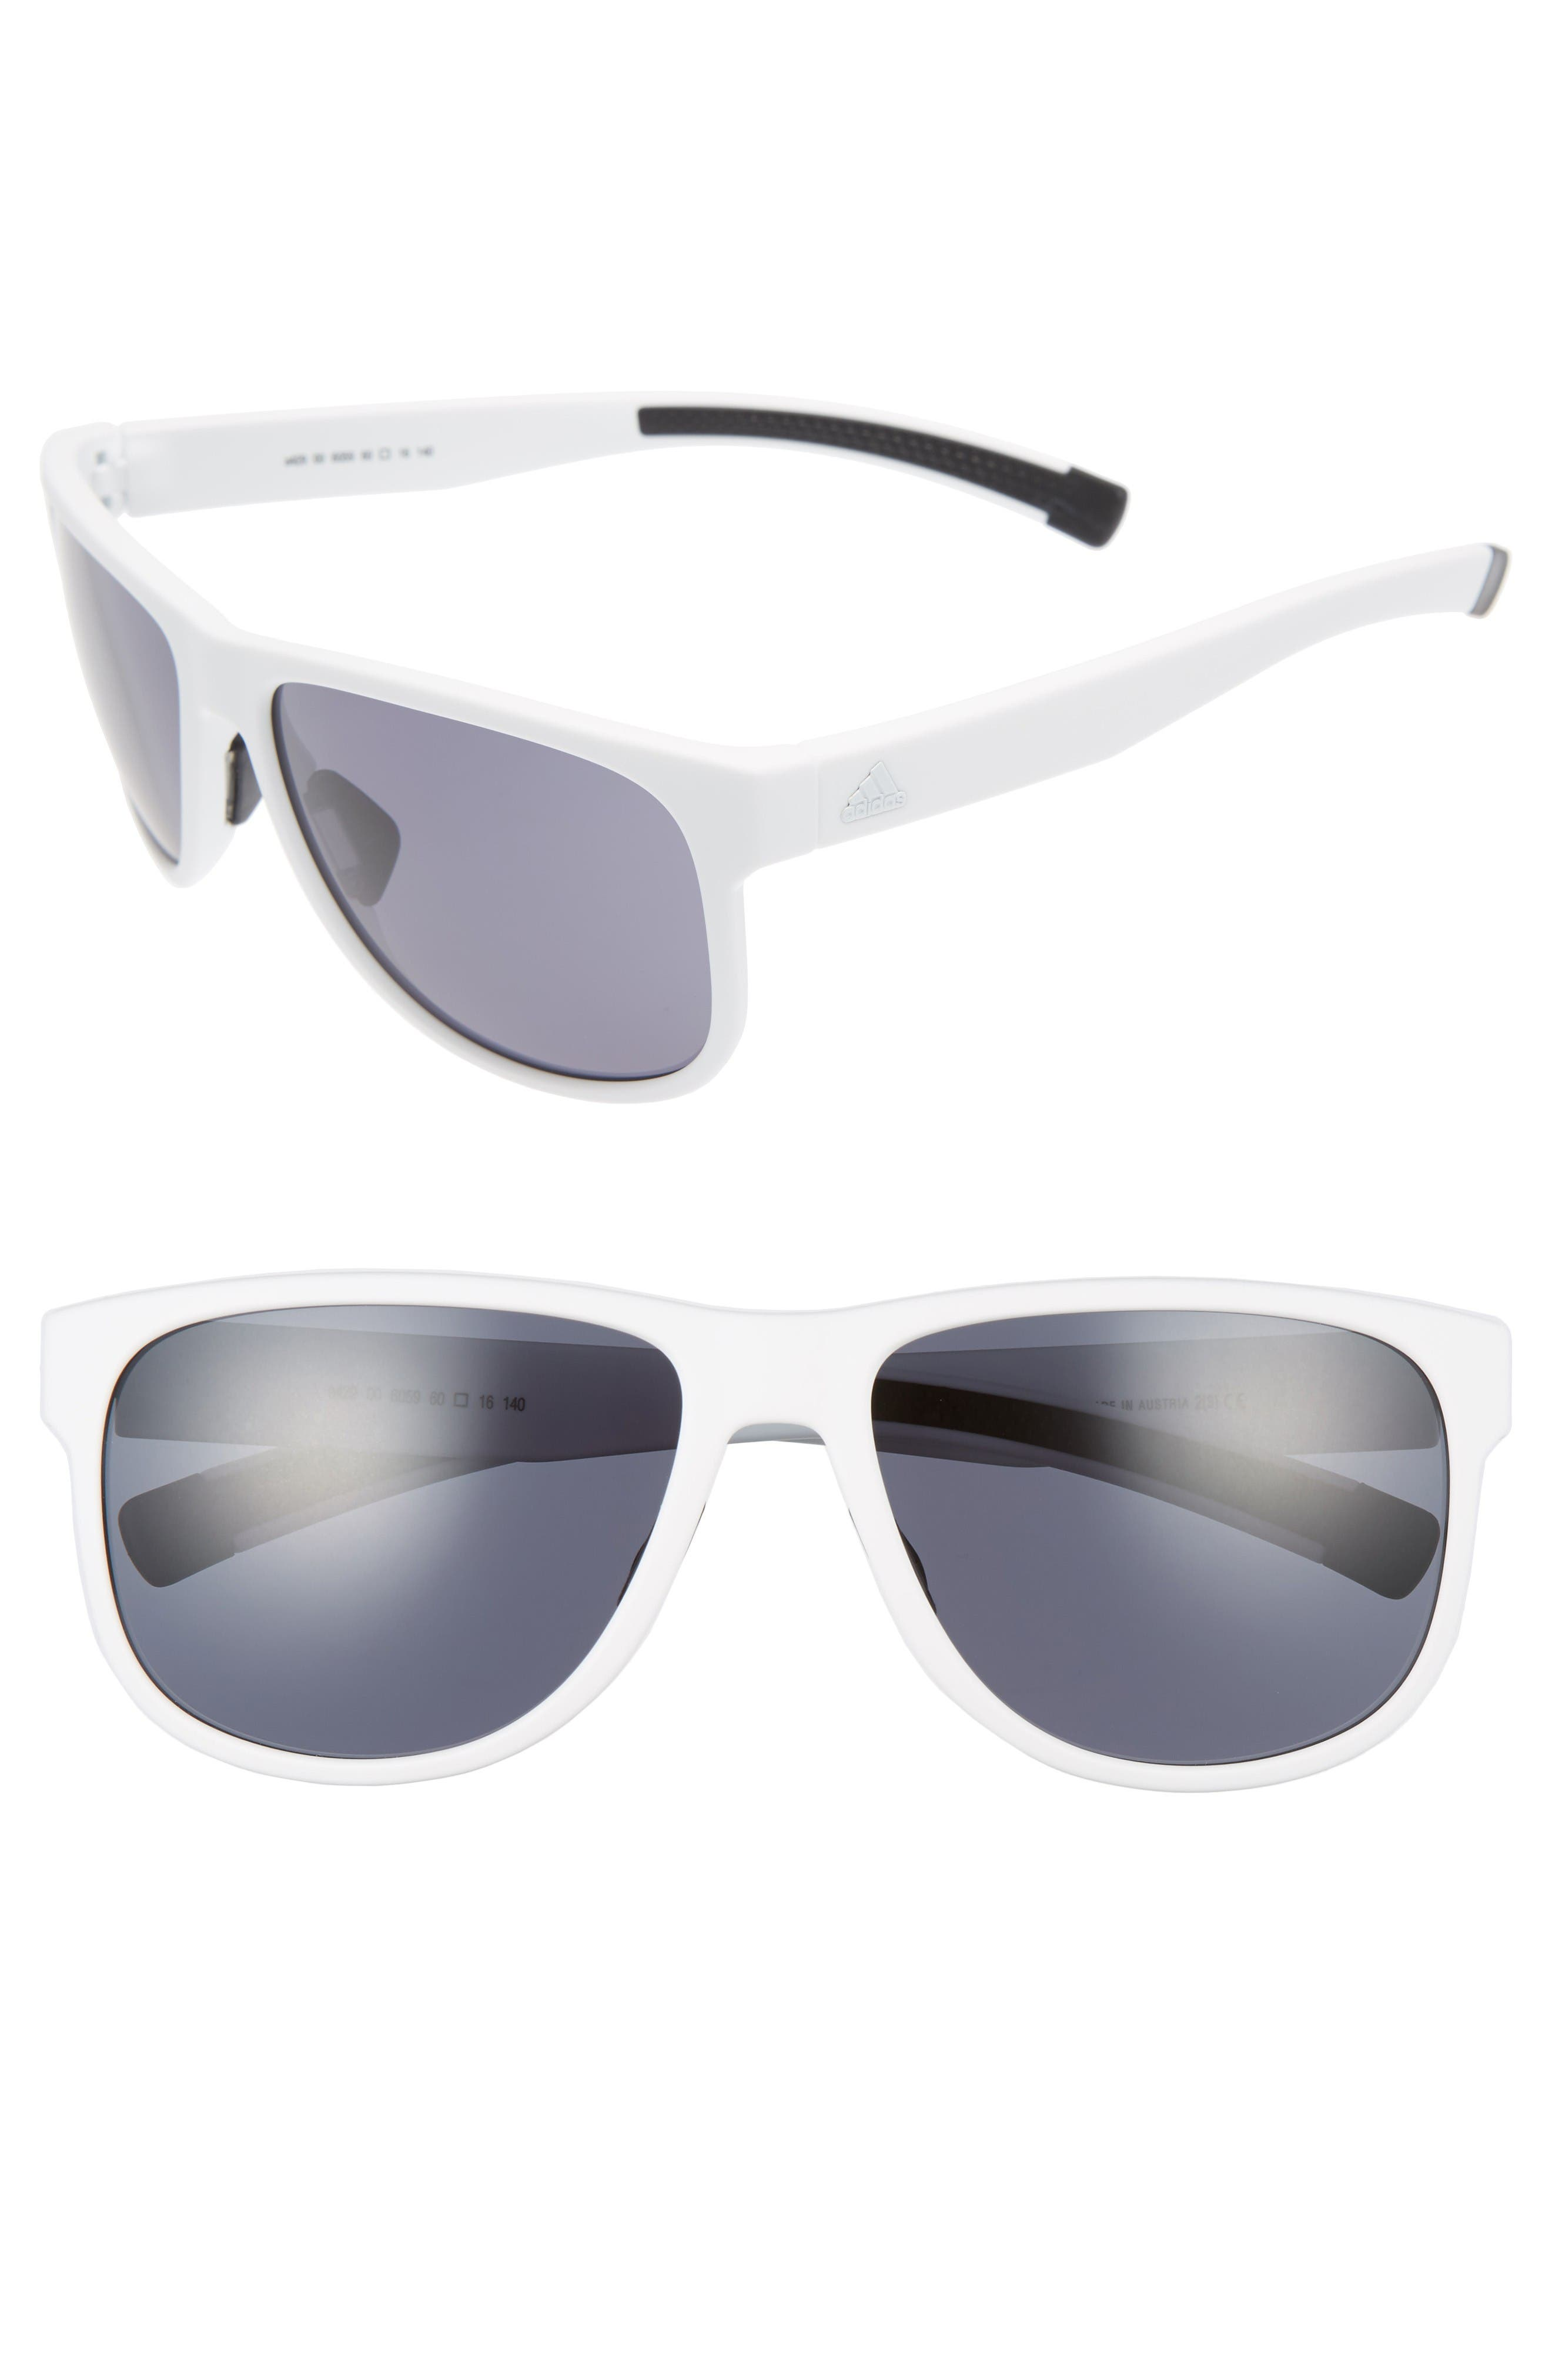 Sprung 60mm Sunglasses,                         Main,                         color, White Matte/ Grey